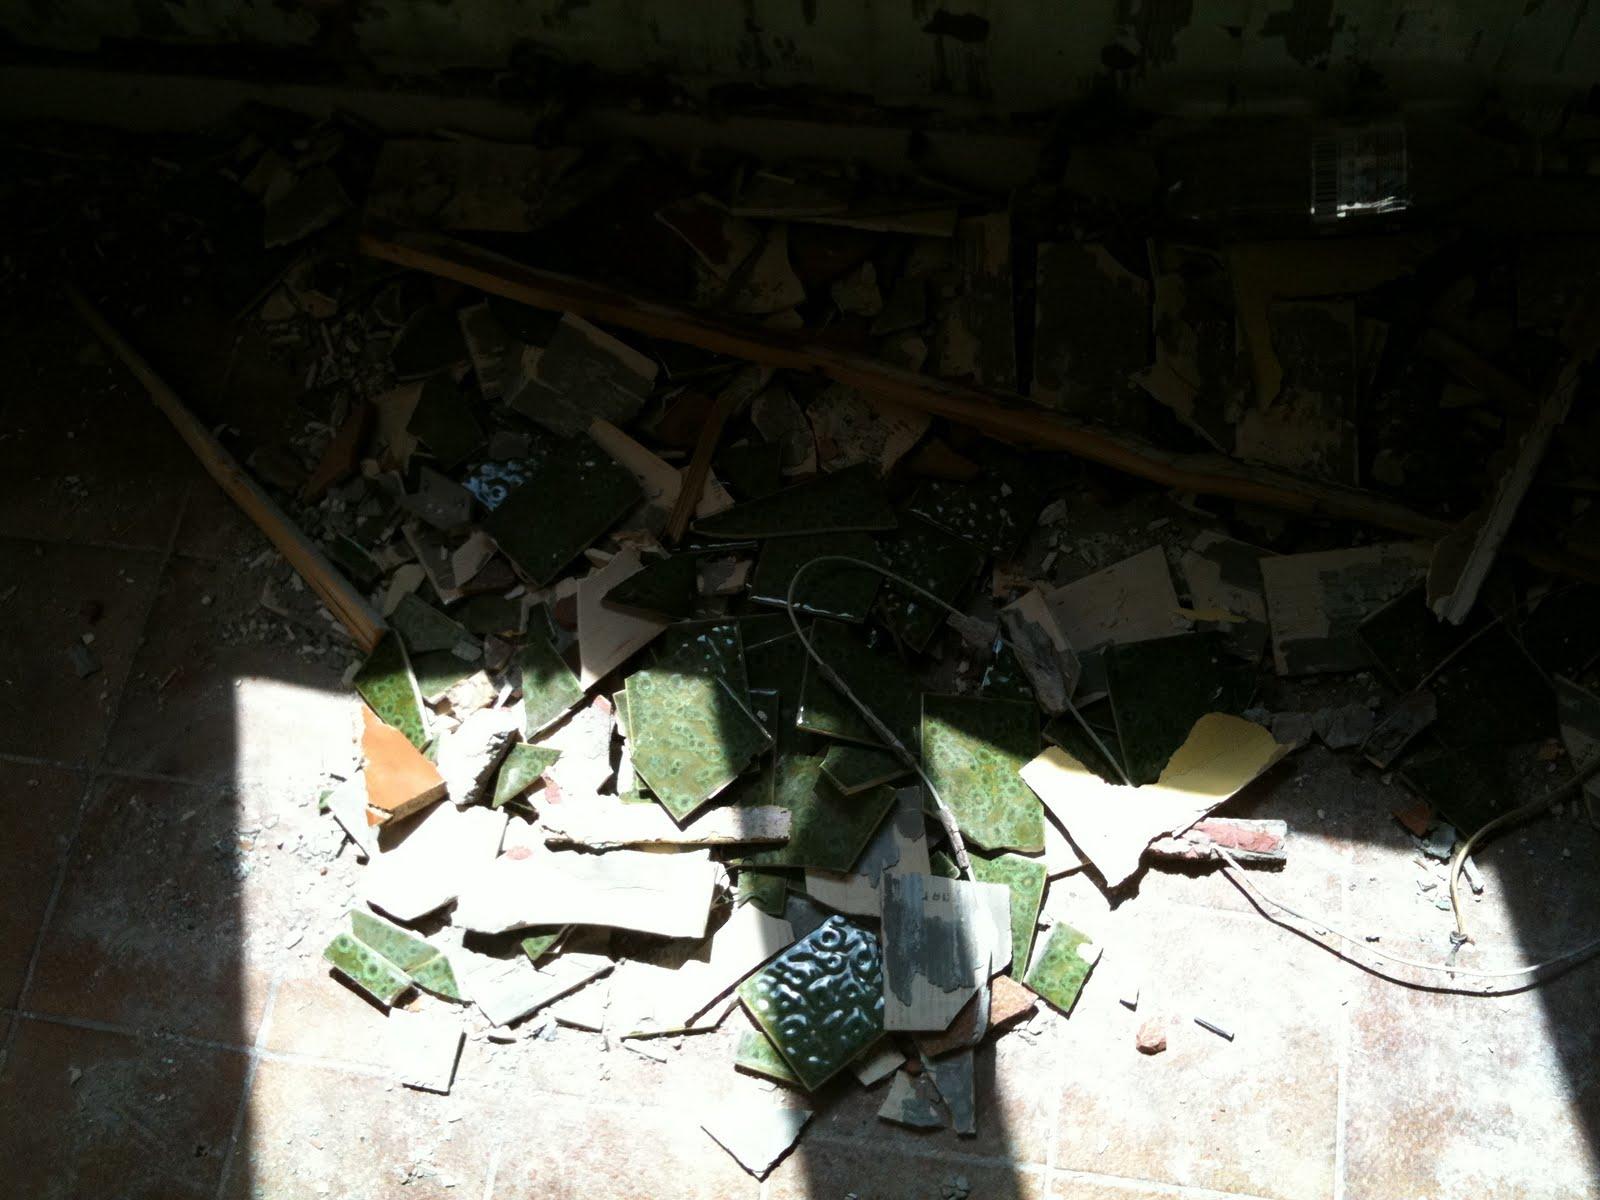 Zaans Huis: Klusdag 4 - stevige plafonds